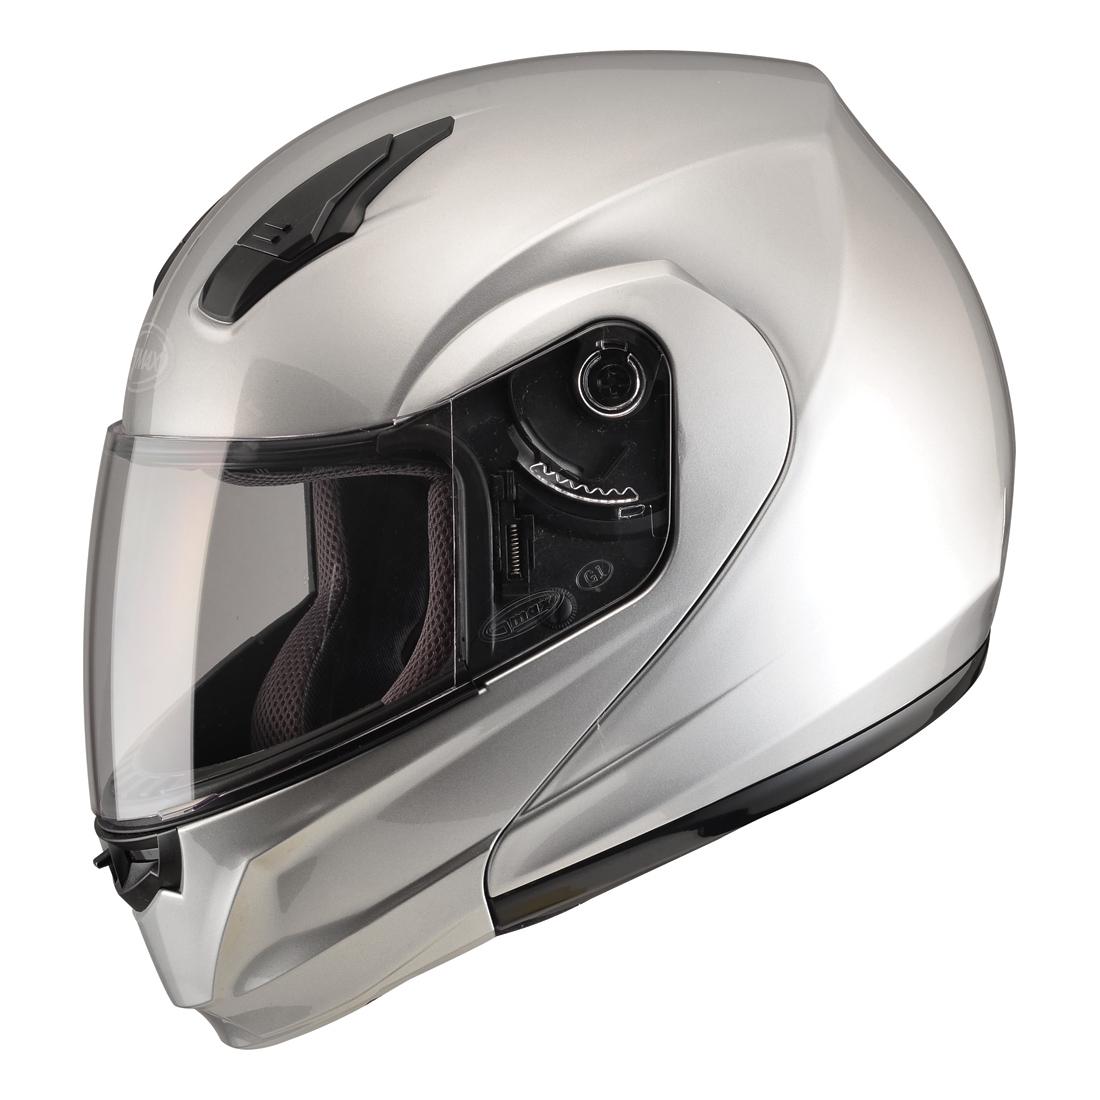 GMAX MD04 Metallic Silver Modular Helmet